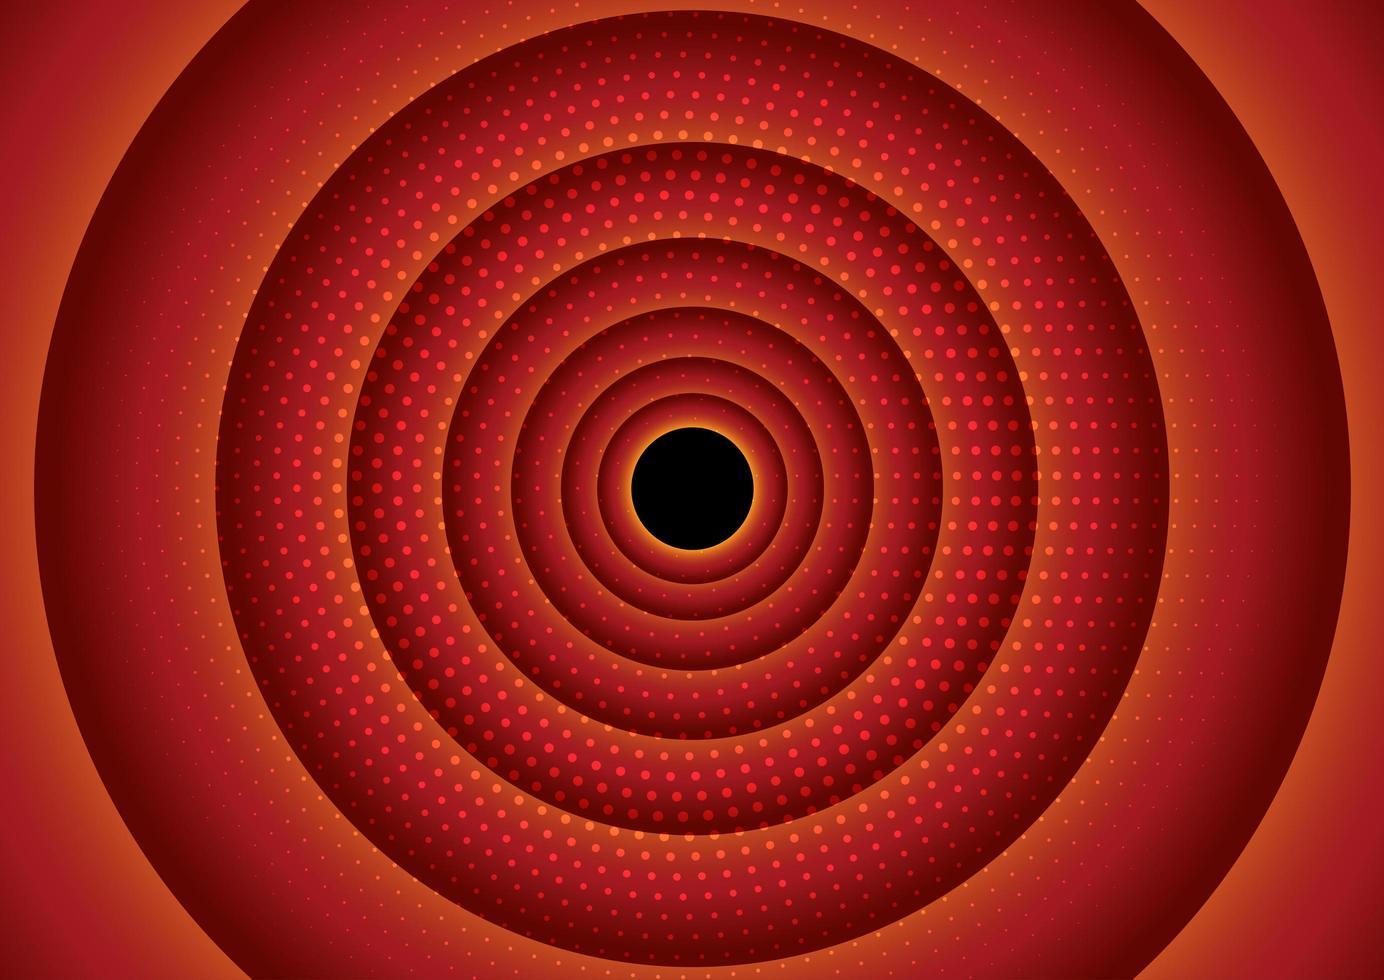 kreisförmiges rotes Halbton-Design vektor